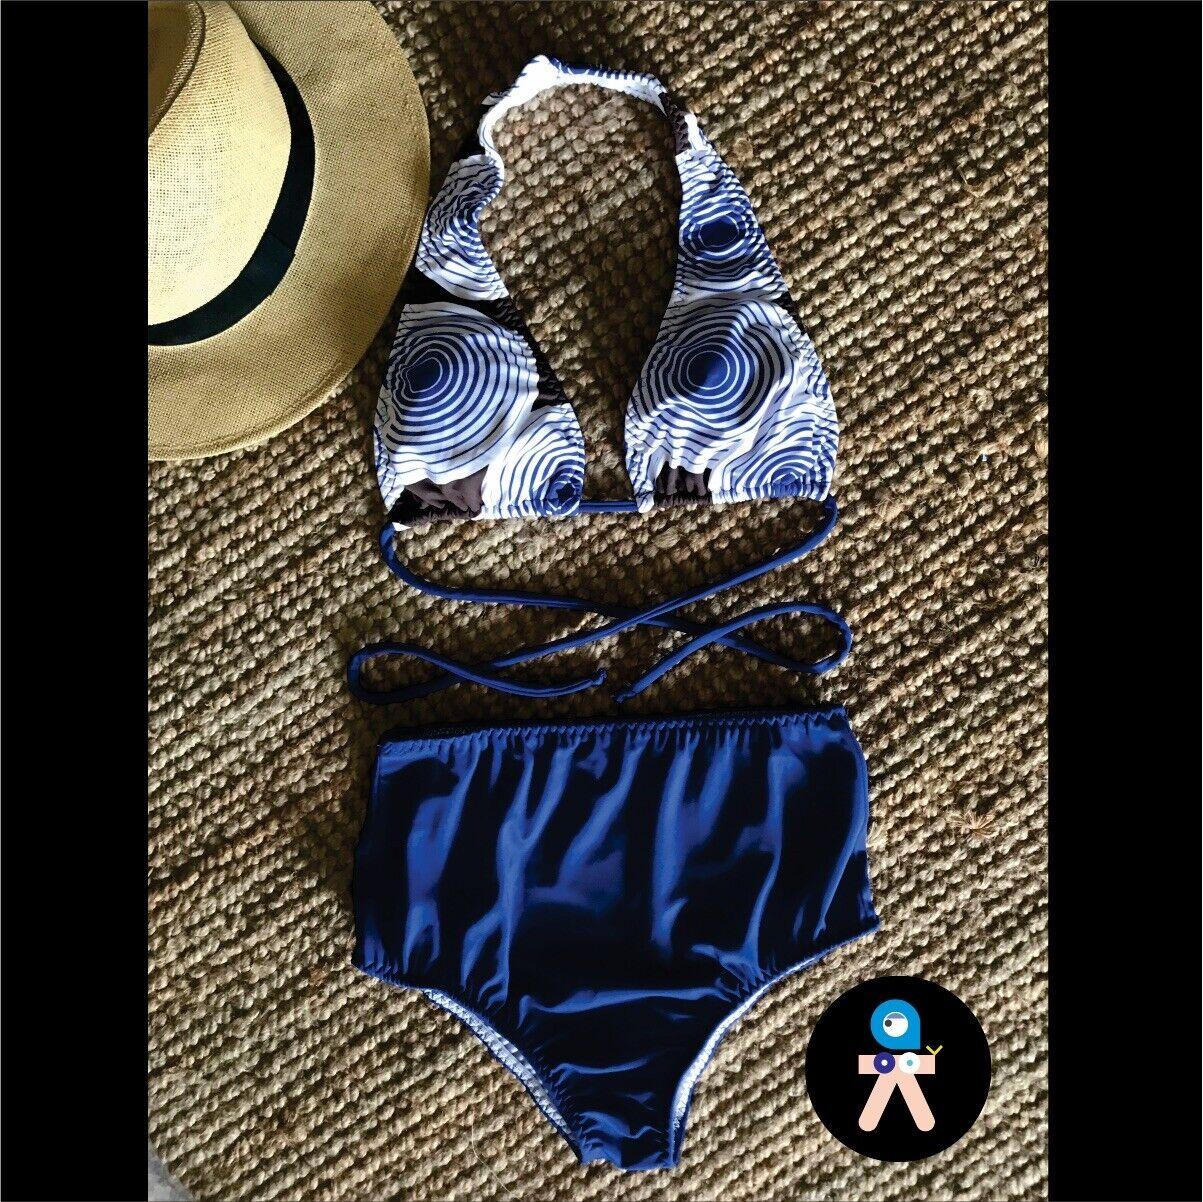 Traje De Baño Dos Piezas,vestido De Baño,bikini,swinsuit,bañador,bañador Alto